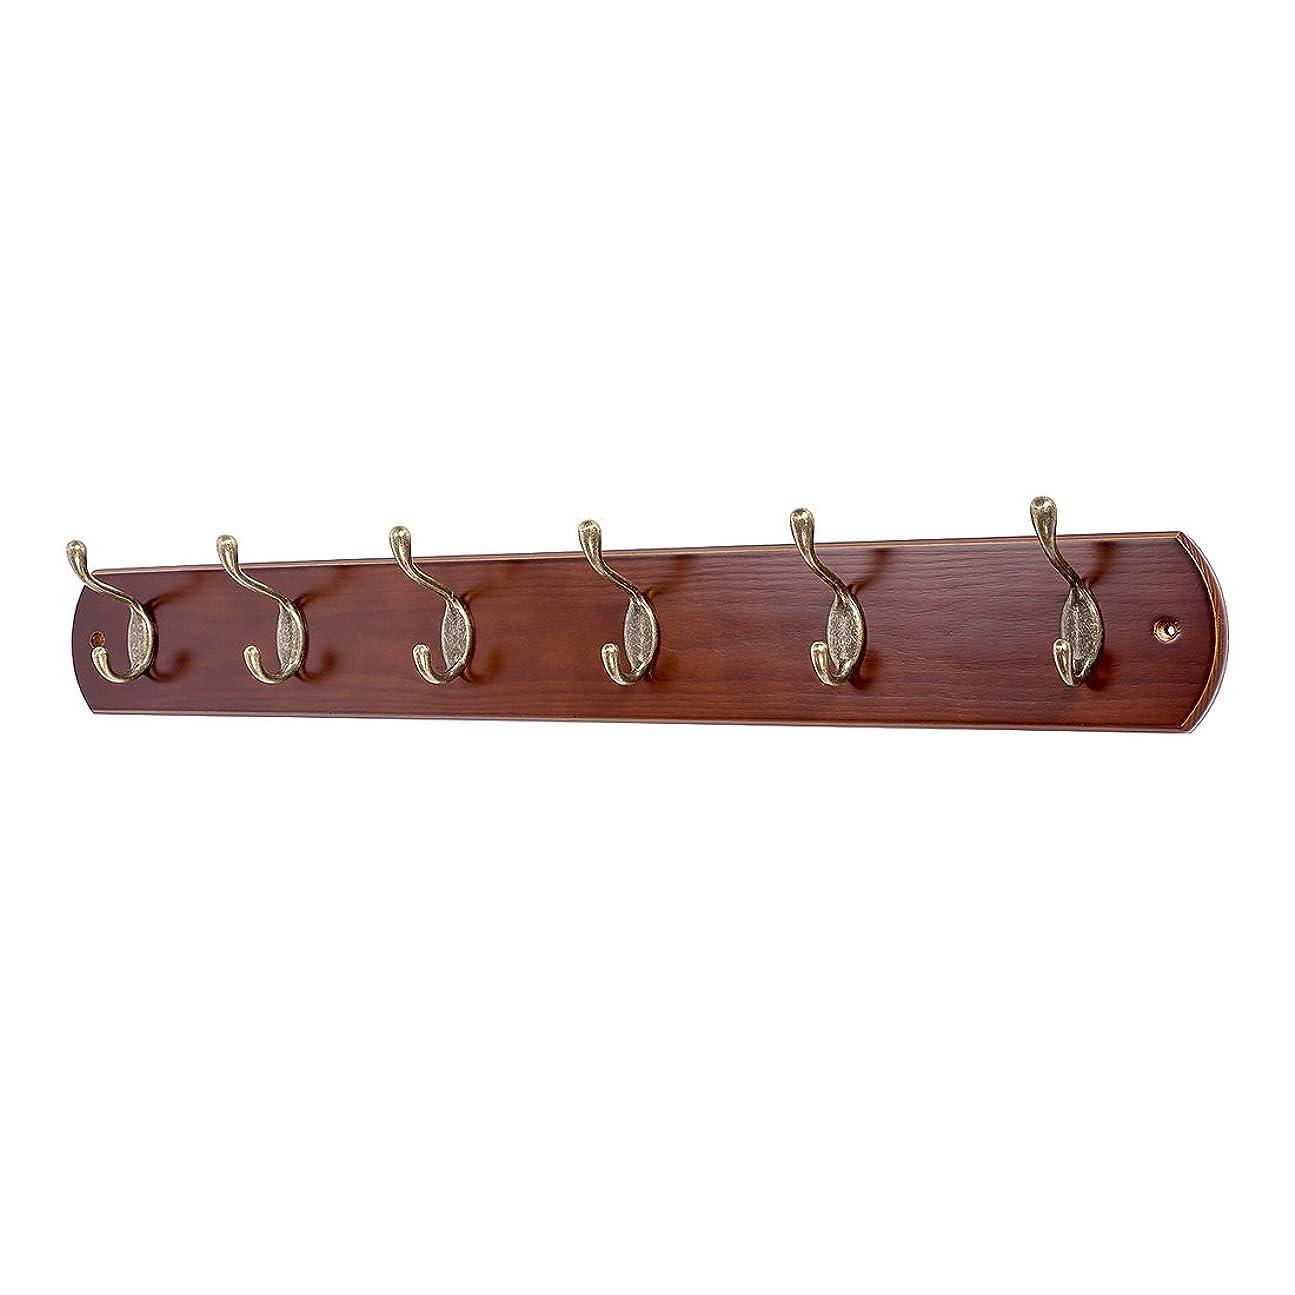 DOKEHOM アンティークゴールドフック6連(4連と6連有り) 壁掛けフック ウォールハンガー ウッドハンガー コート掛け 壁掛け収納 天然木材 ネジ取り付け (胡桃色)